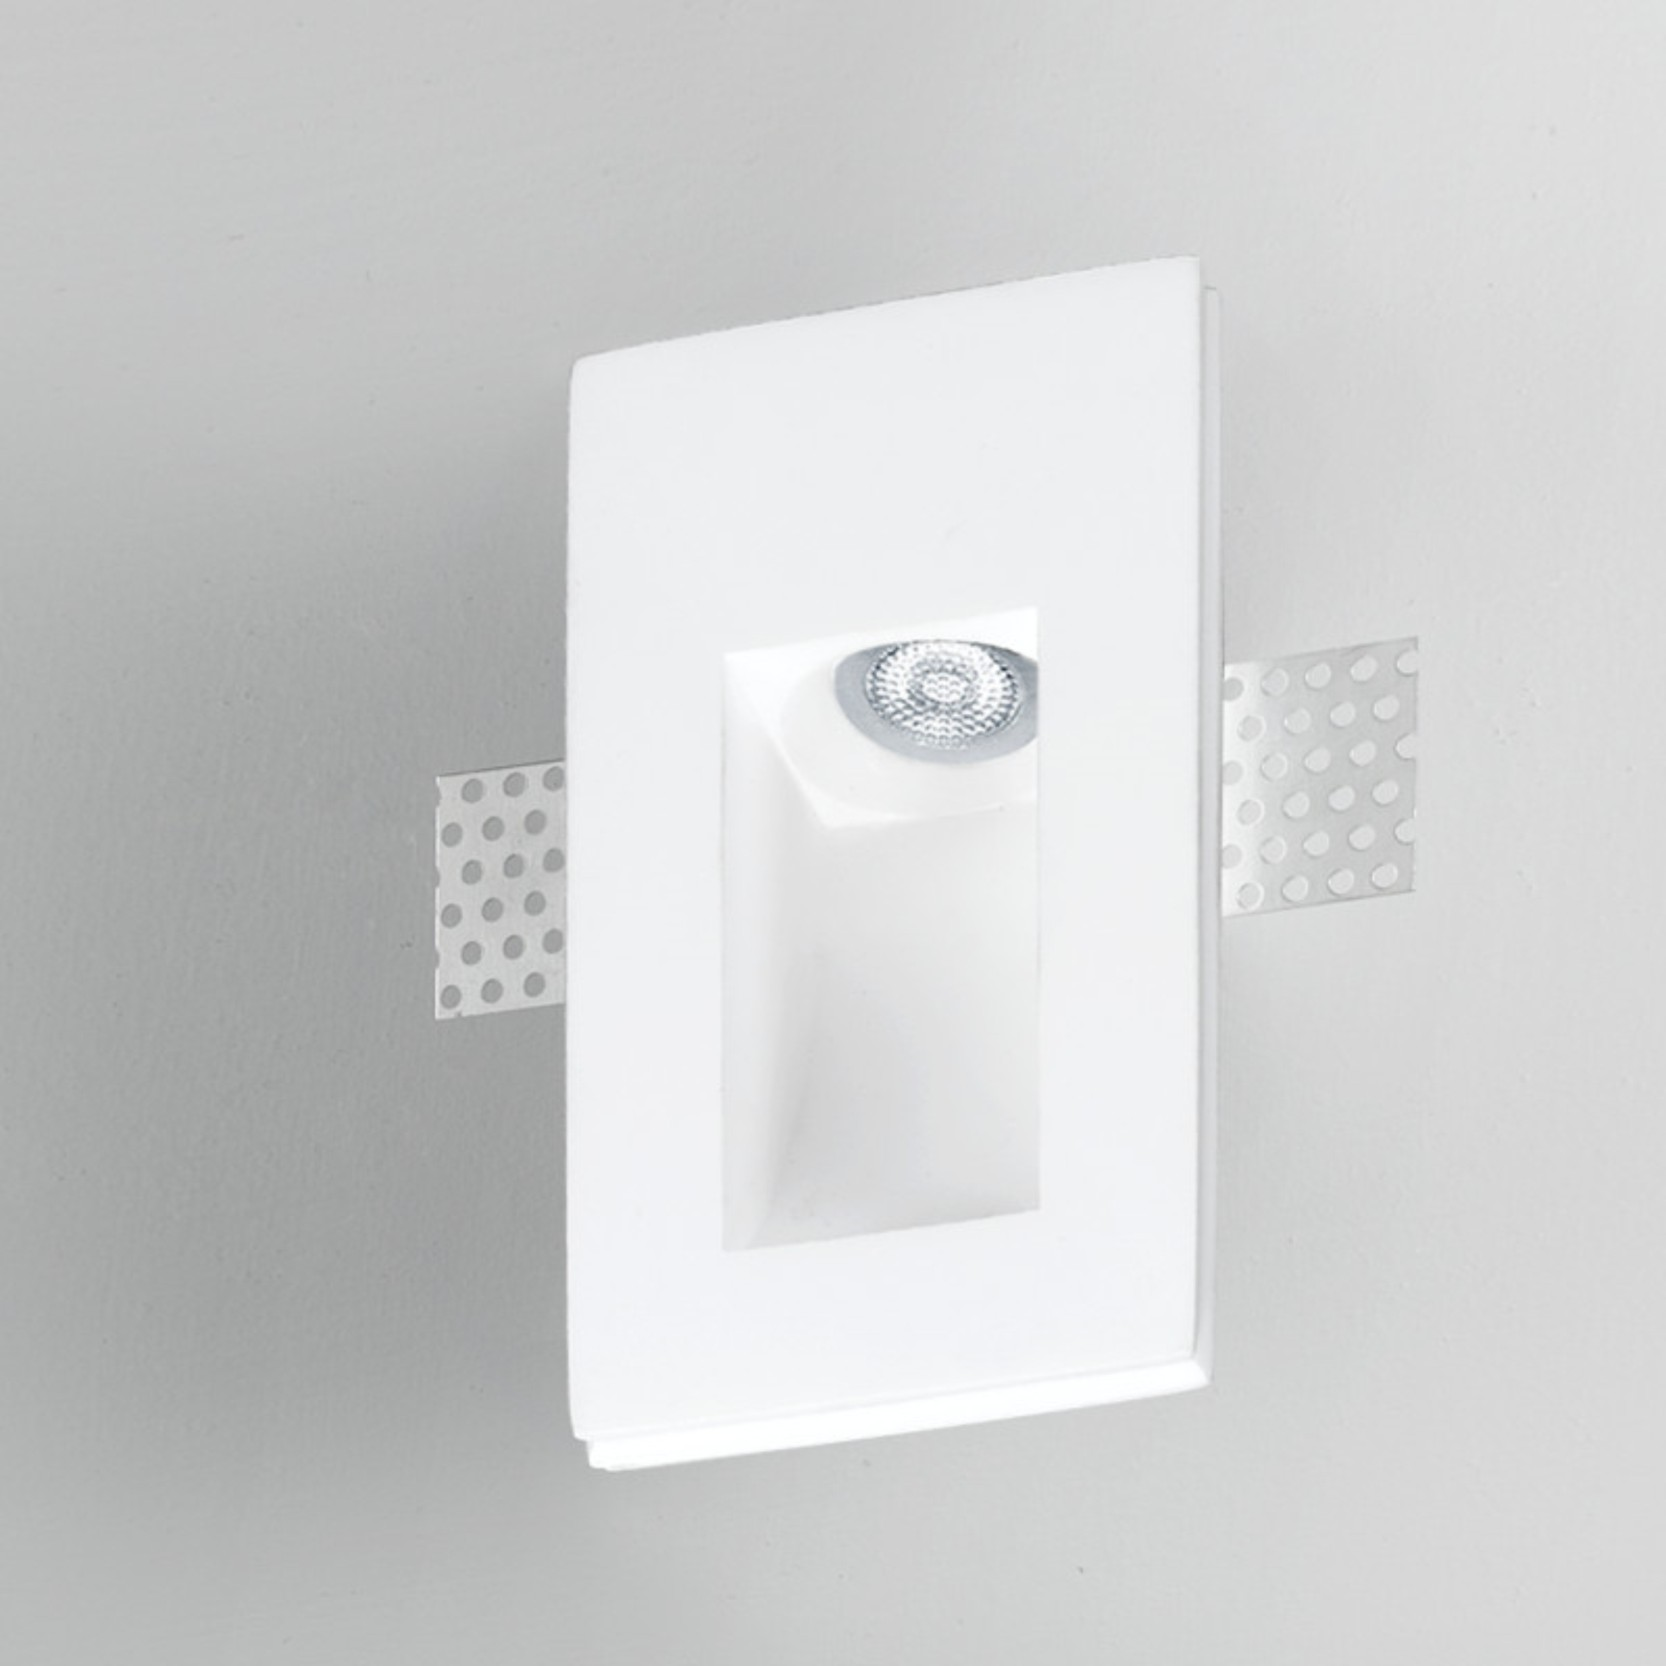 Invisibili by Panzeri – 3 1/8″ x 6 1/2″ Trimless,  offers quality European interior lighting design | Zaneen Design